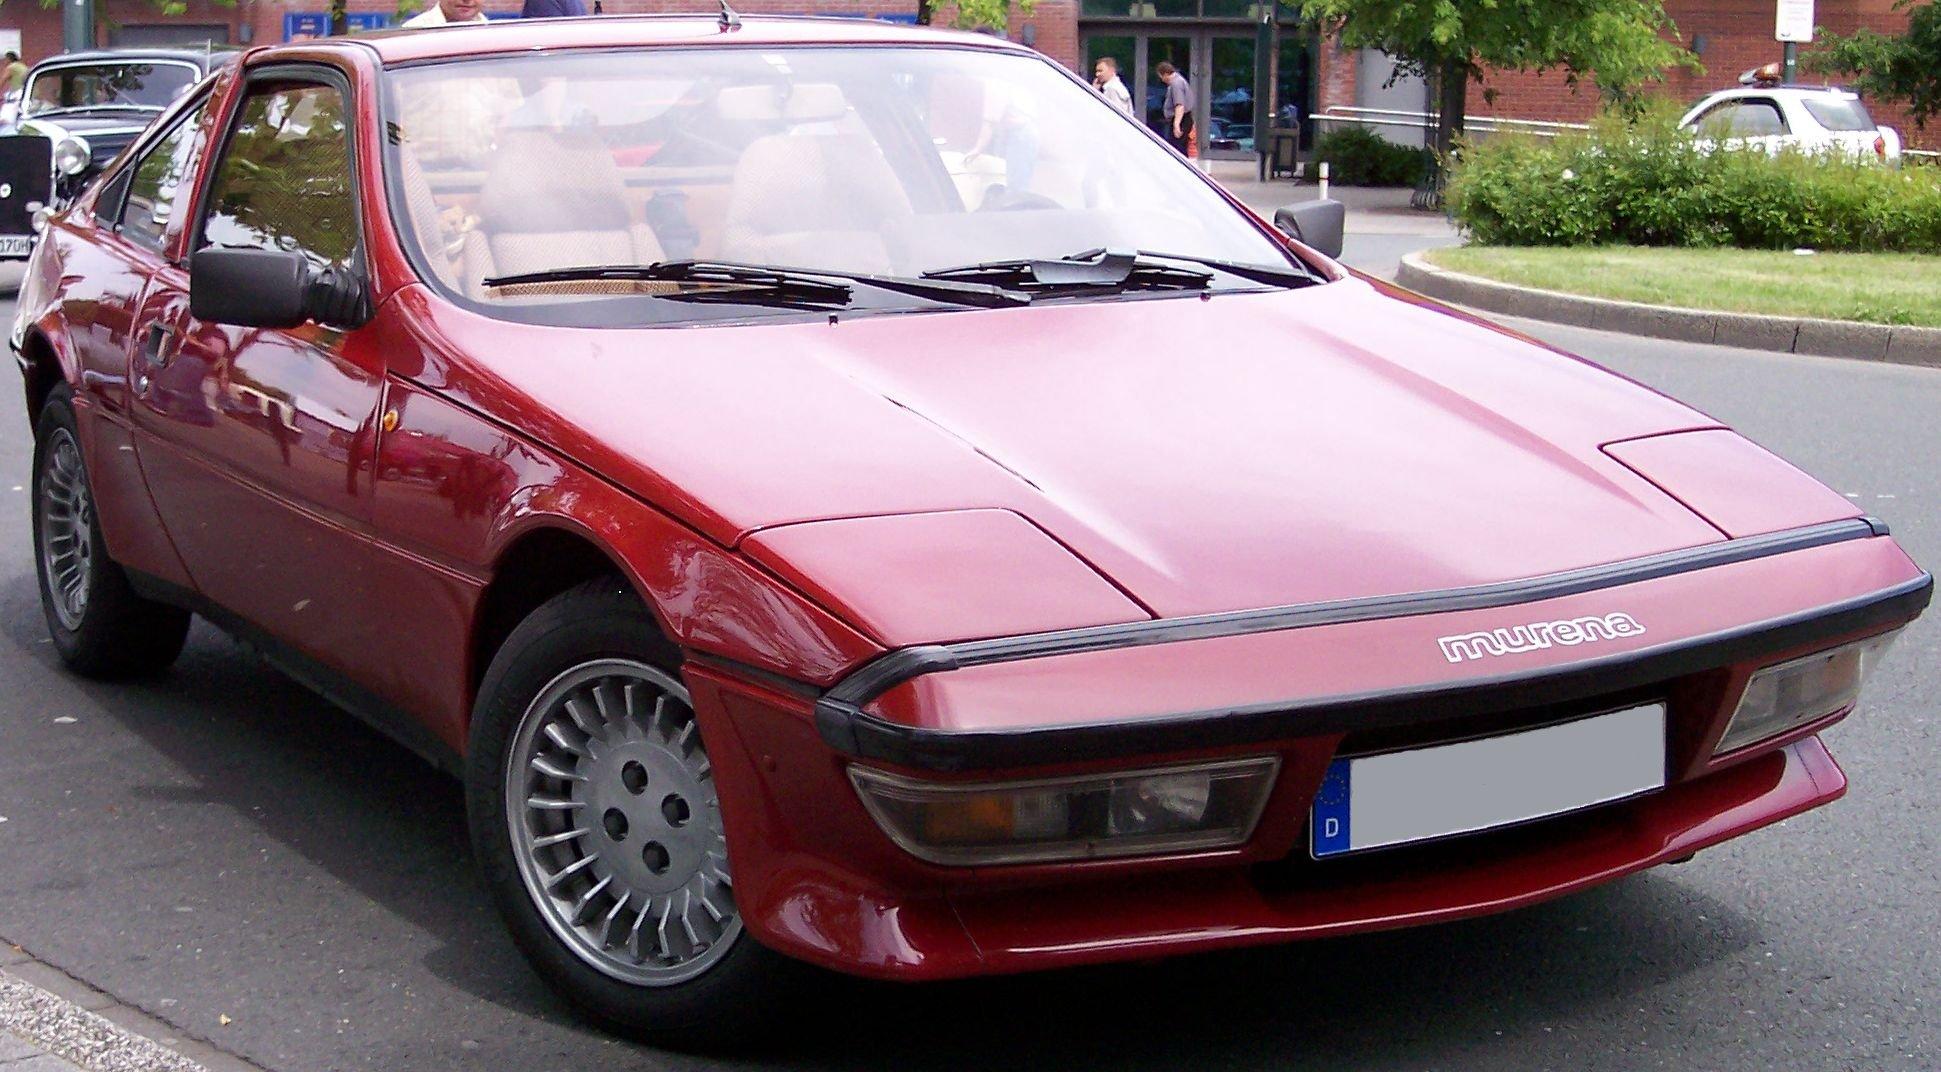 56874080 8 furthermore Daewoo Tacuma Rezzo 2004 moreover Volvo V50 2007 in addition SR48E9 besides Nissan Almera Pulsar 5 Doors 2002. on alpine car interior